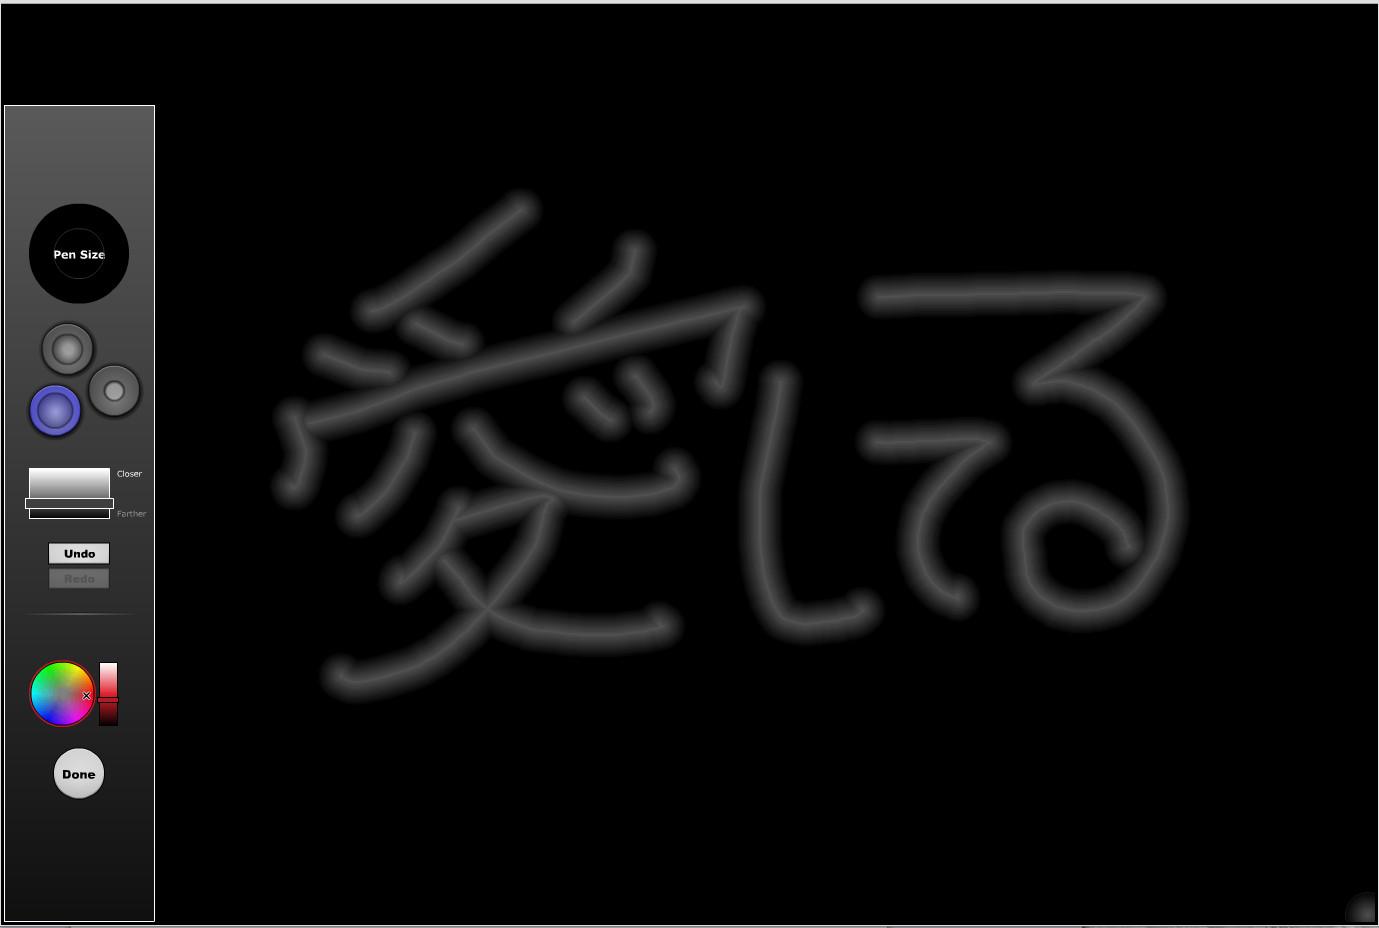 bandicam 2016-04-15 02-08-59-620